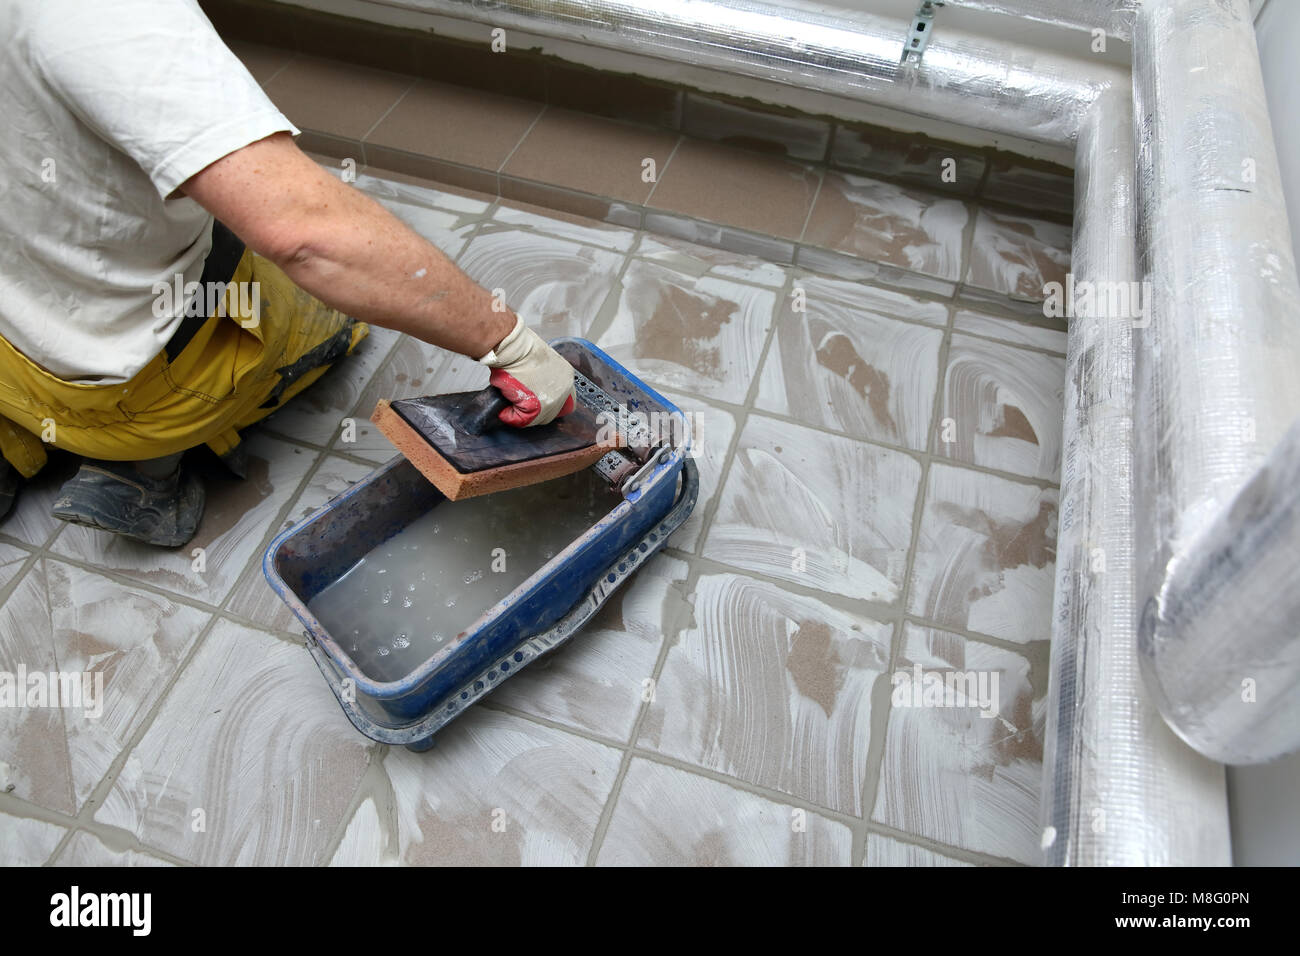 Laying terracotta floor tiles columbialabelsfo terracotta floor tiles stock photos u0026 terracotta floor tiles stock dailygadgetfo Choice Image